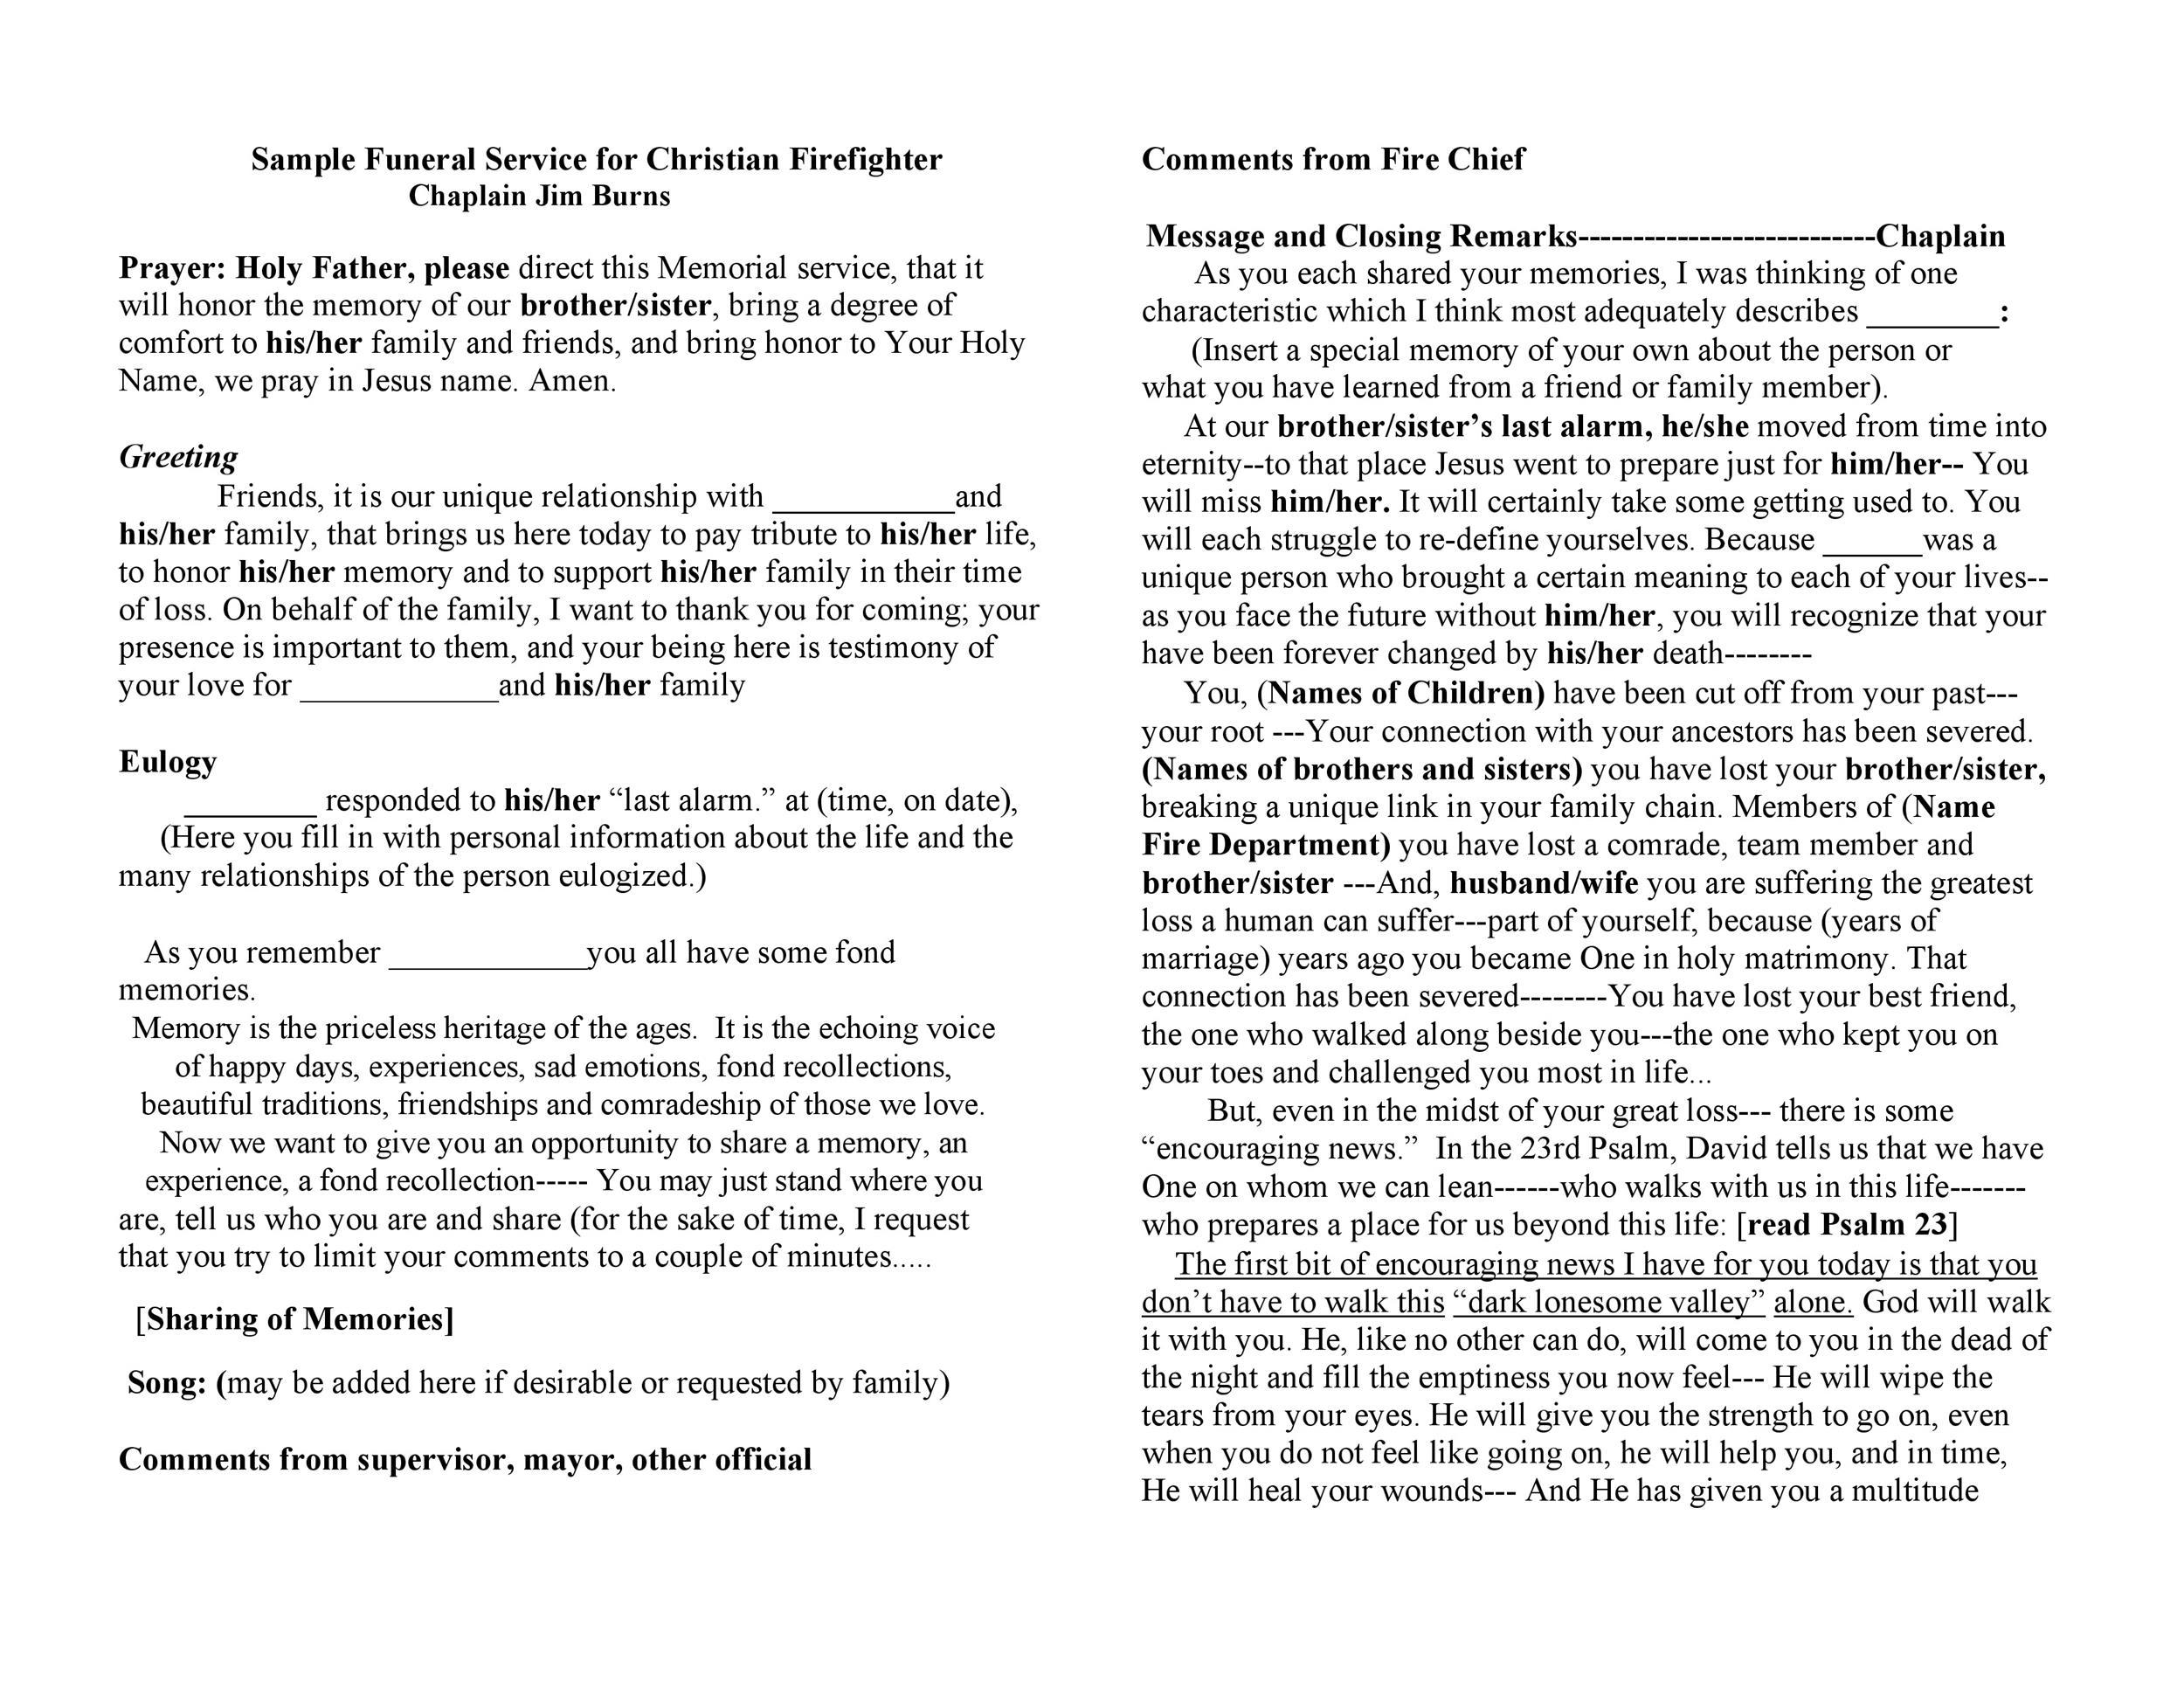 Free funeral program template 03